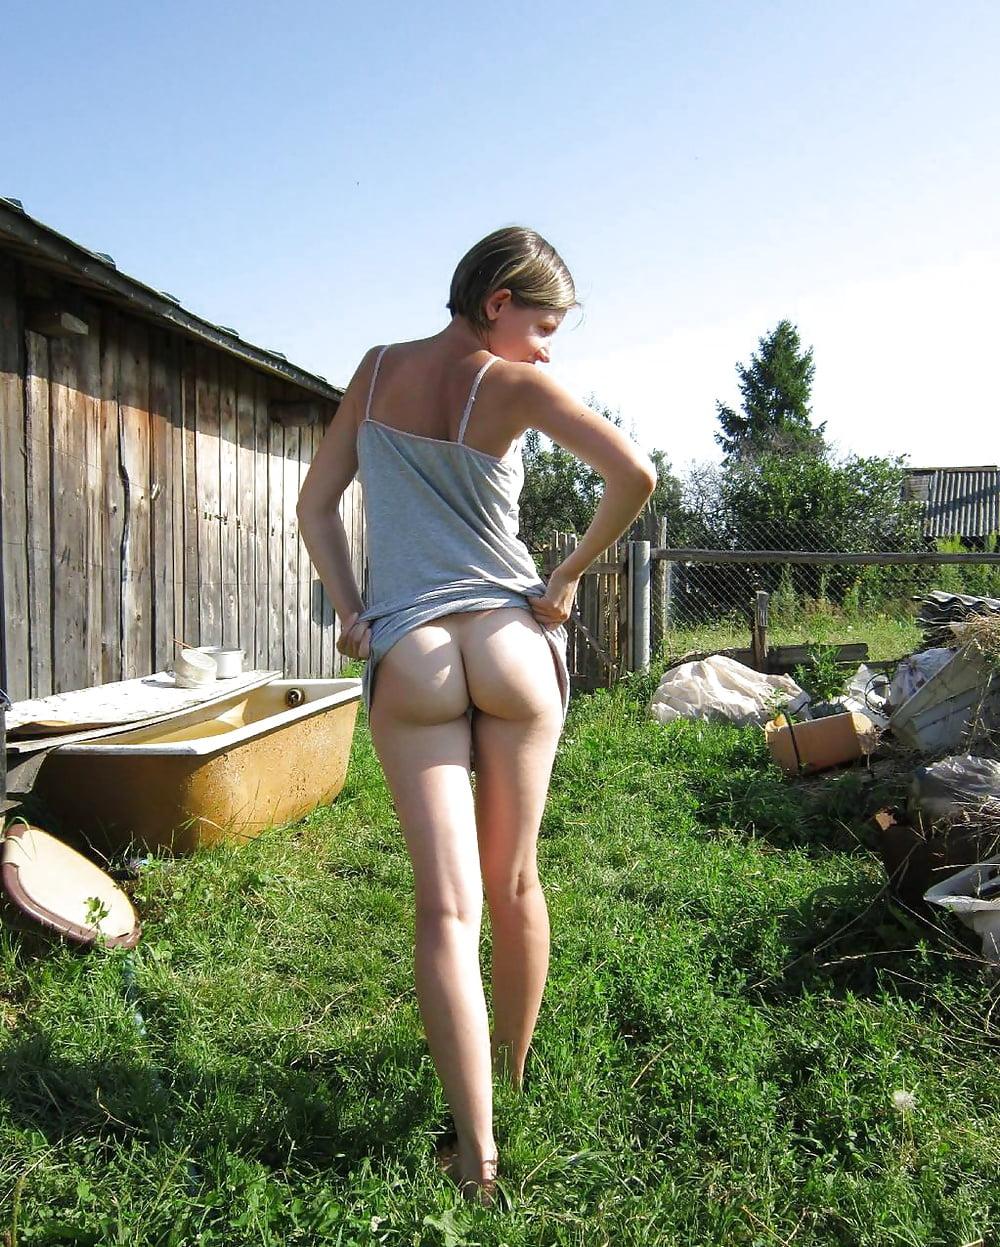 Домашнее фото без трусов в деревне